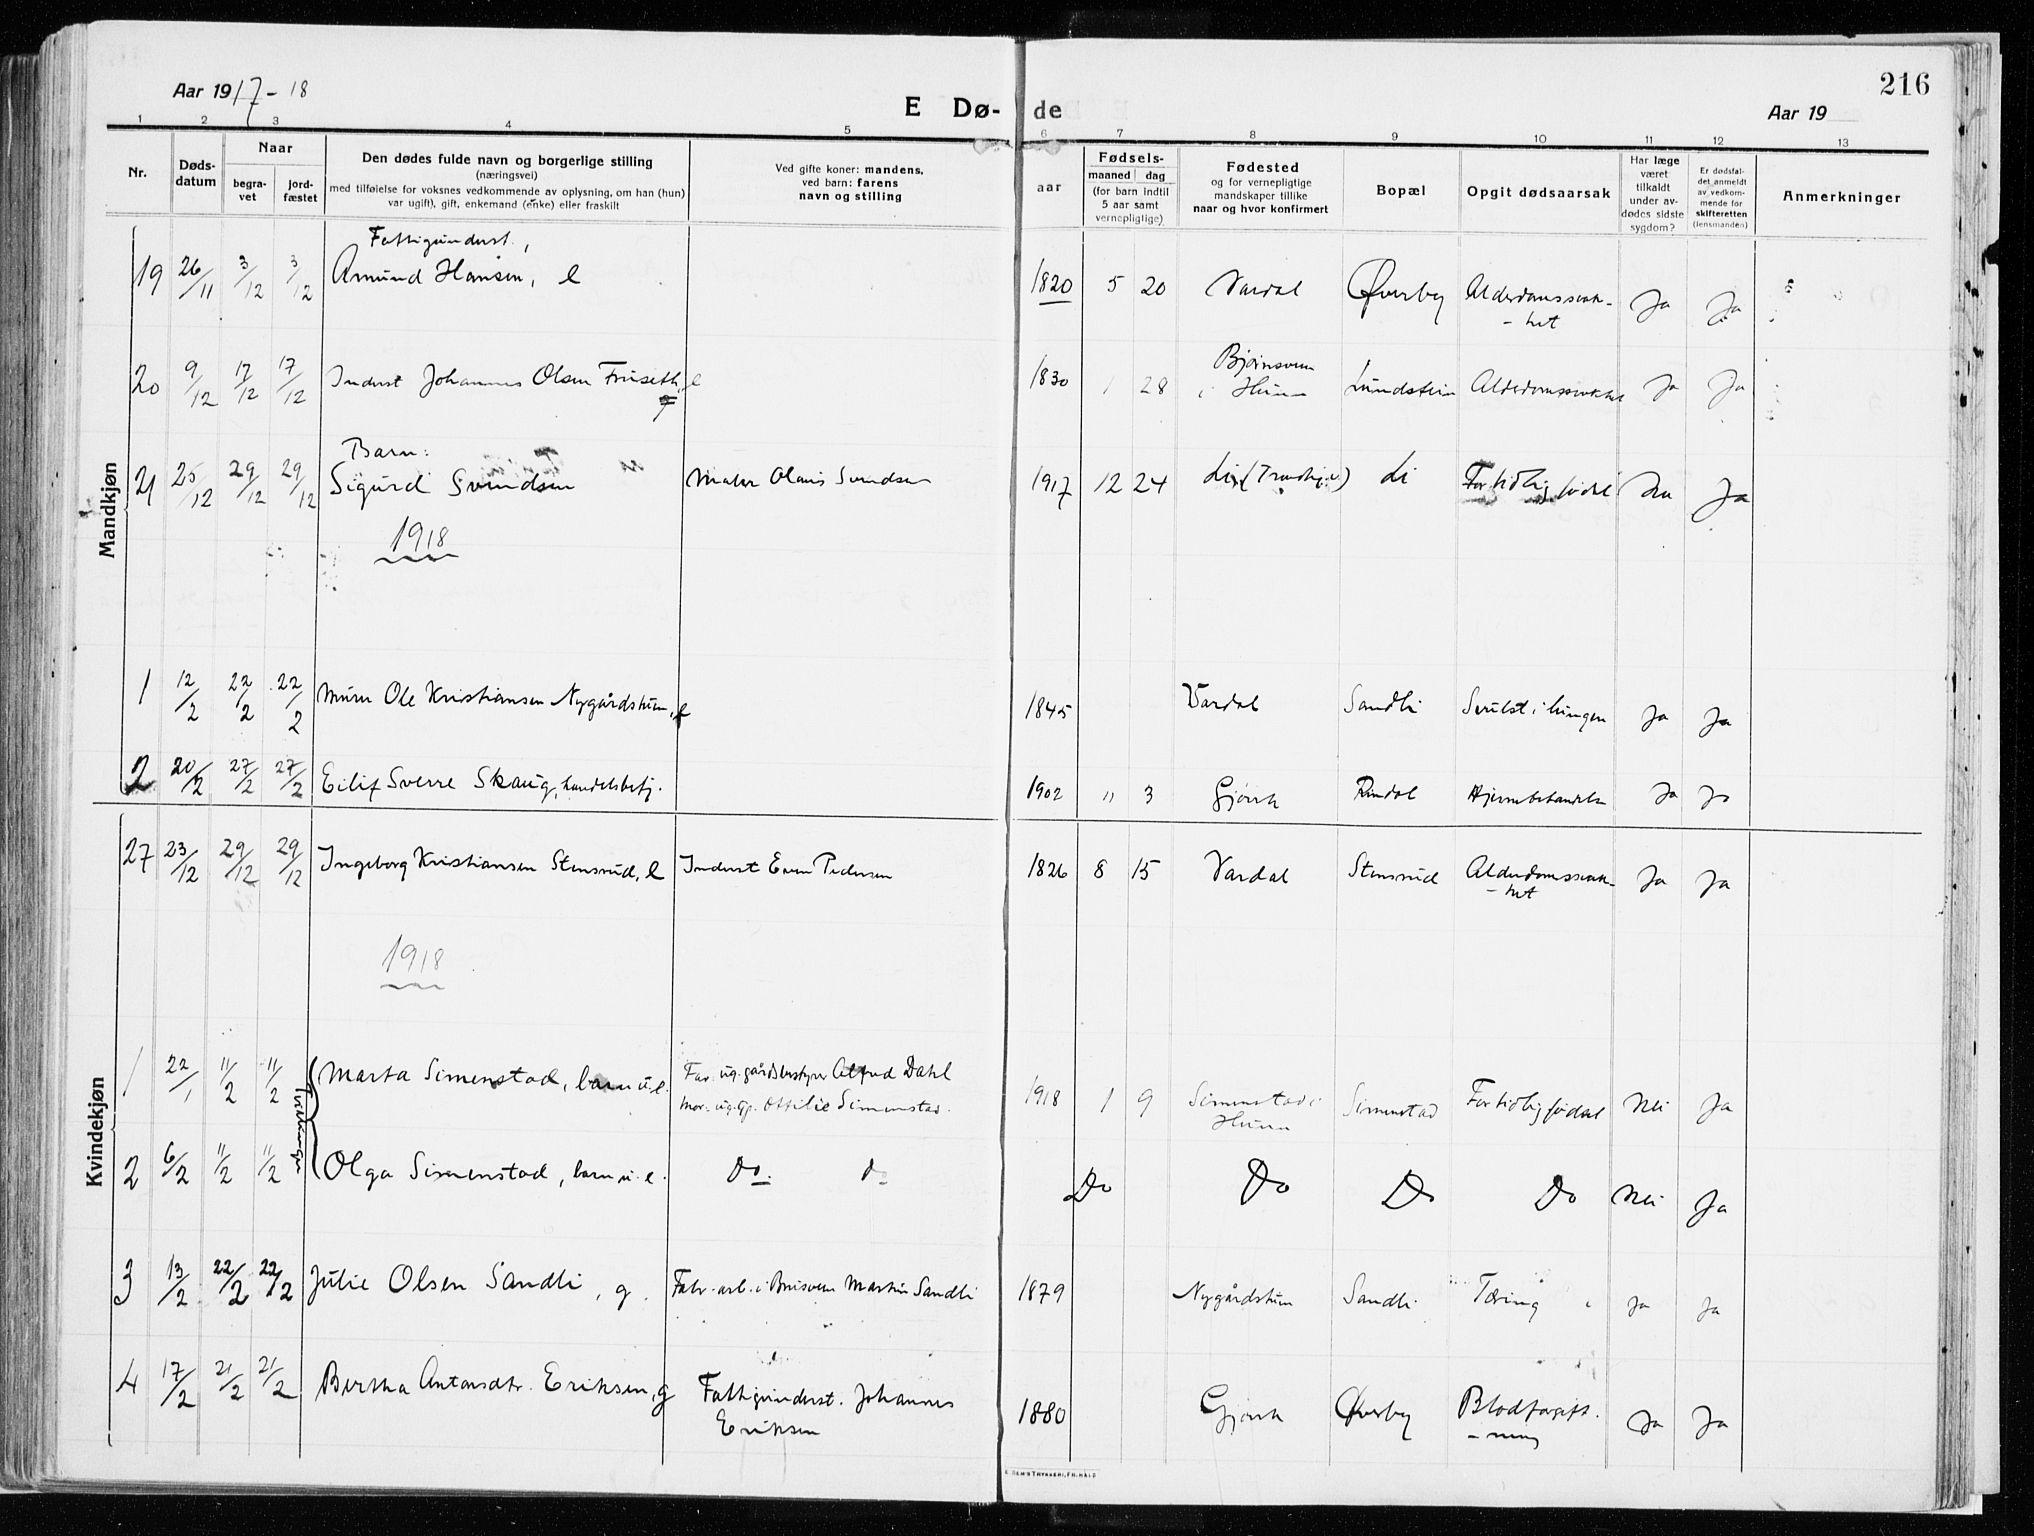 SAH, Vardal prestekontor, H/Ha/Haa/L0017: Ministerialbok nr. 17, 1915-1929, s. 216